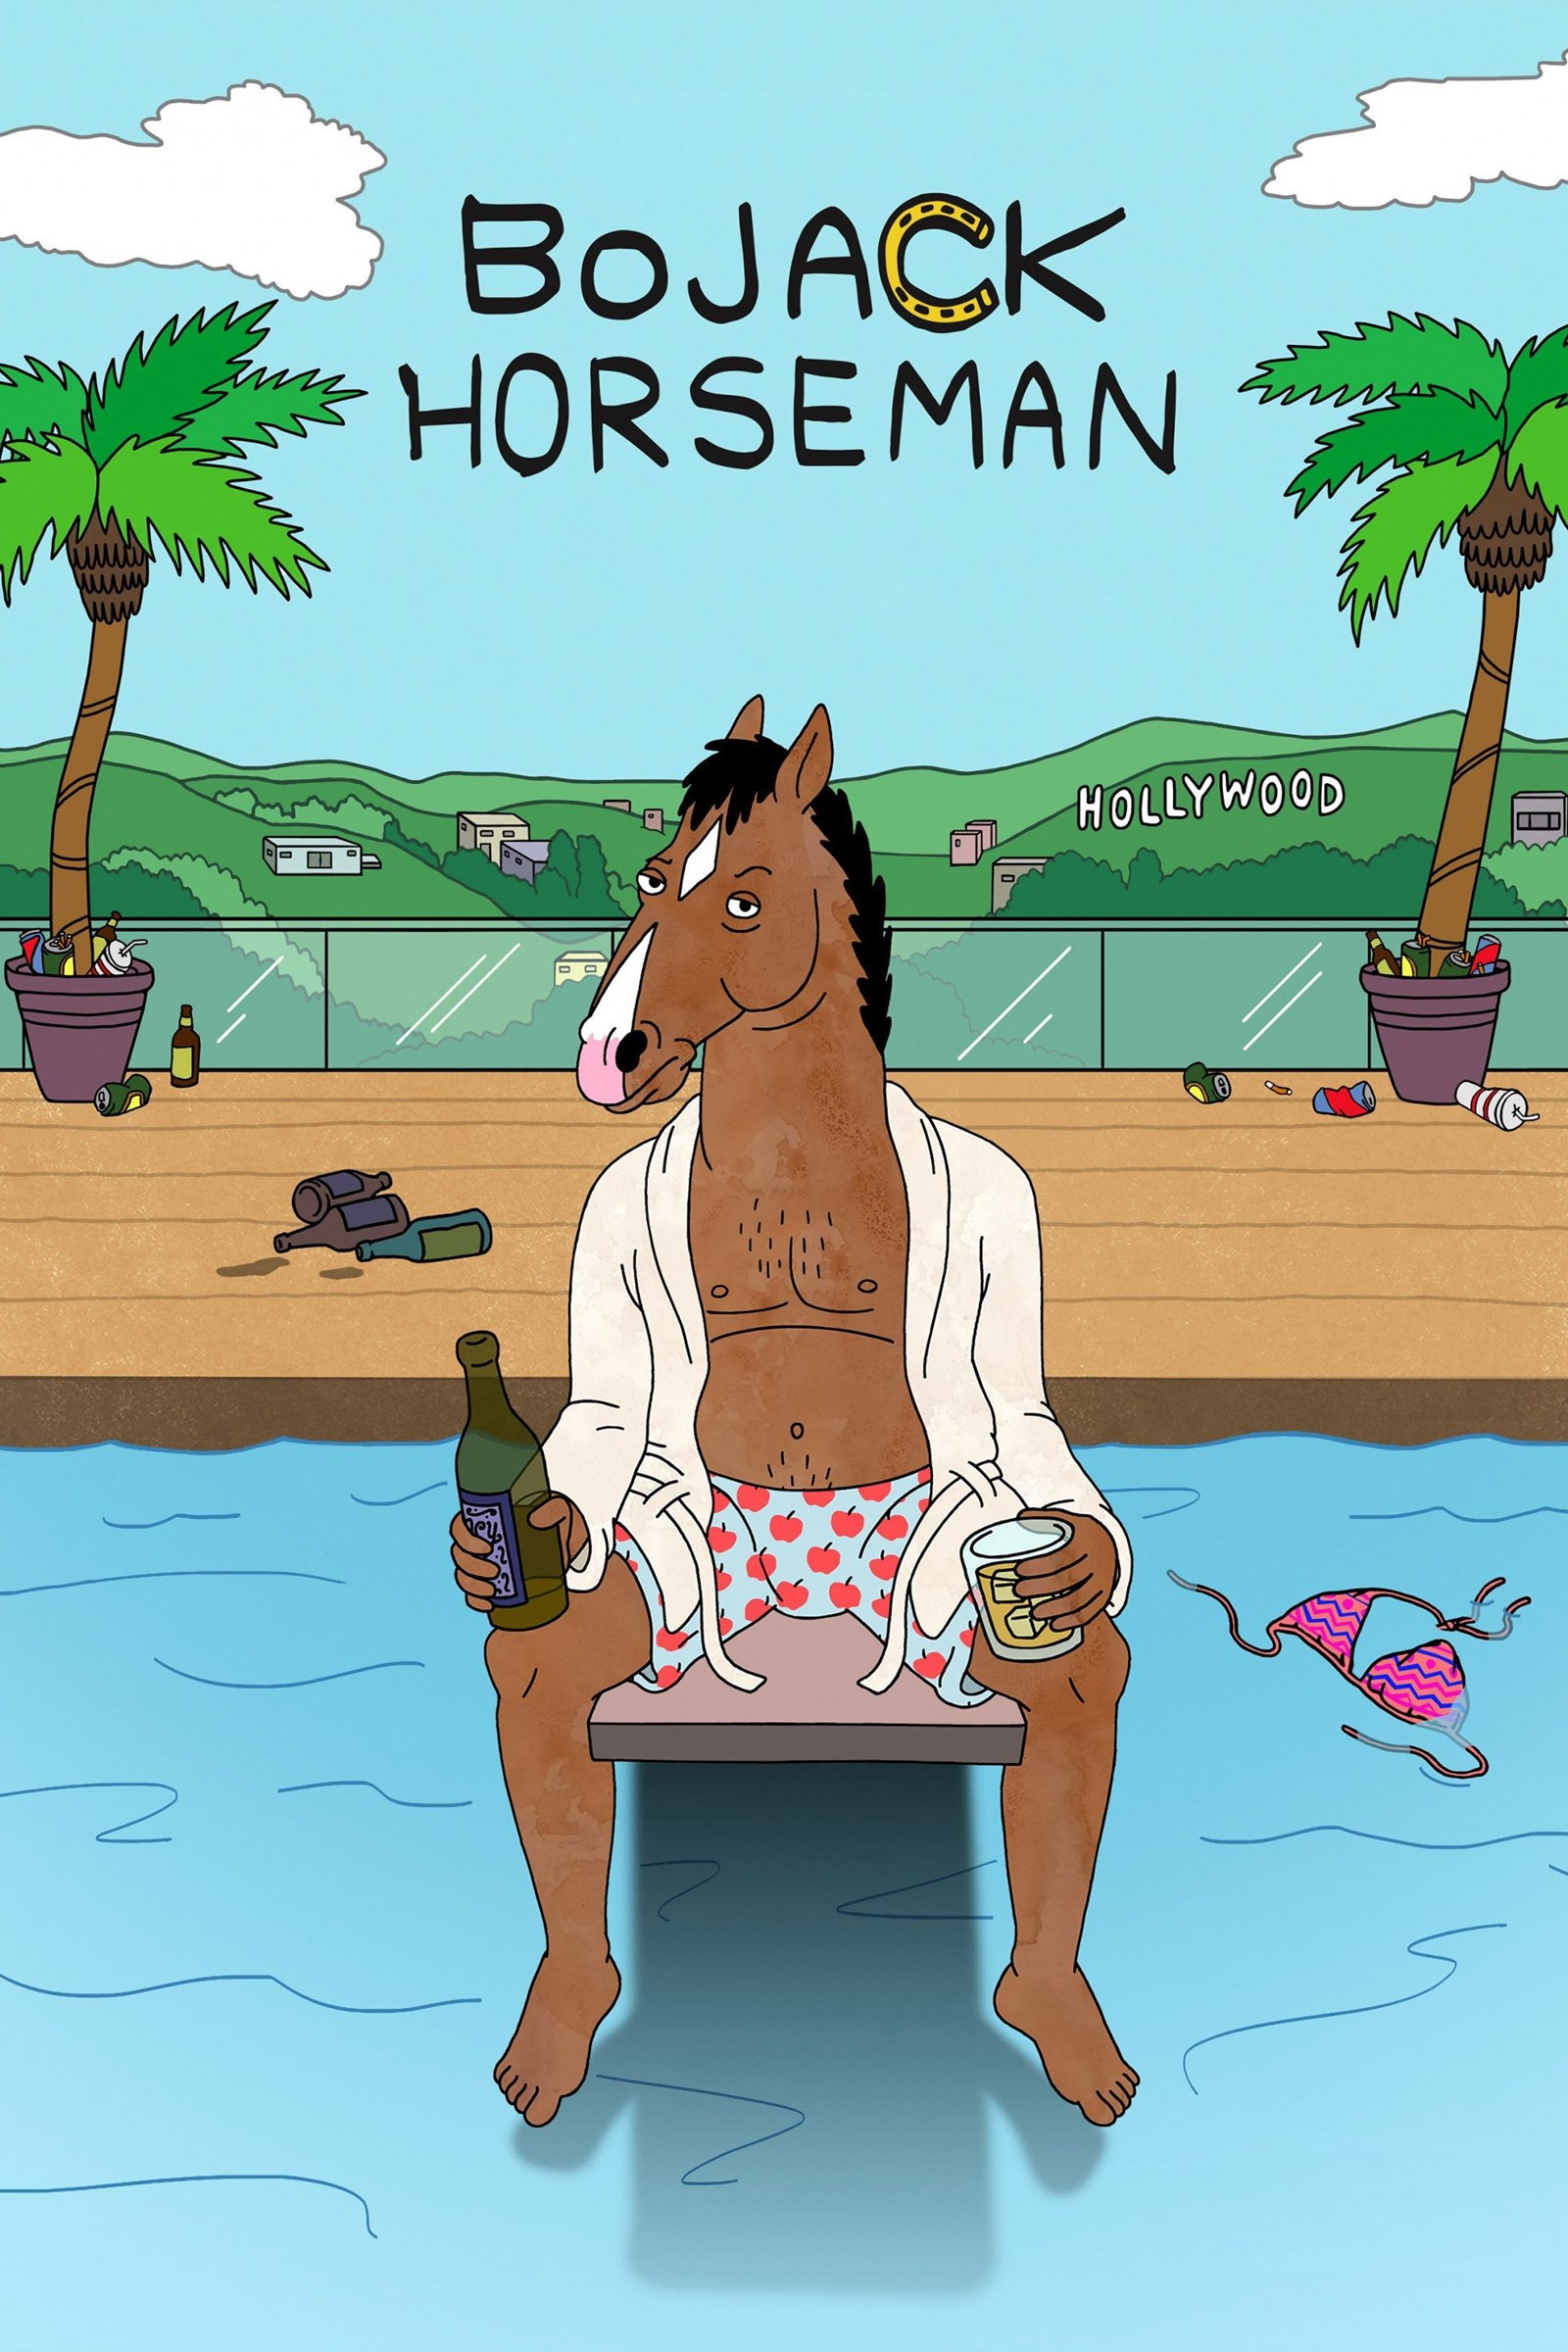 Bojack Horseman Season 1